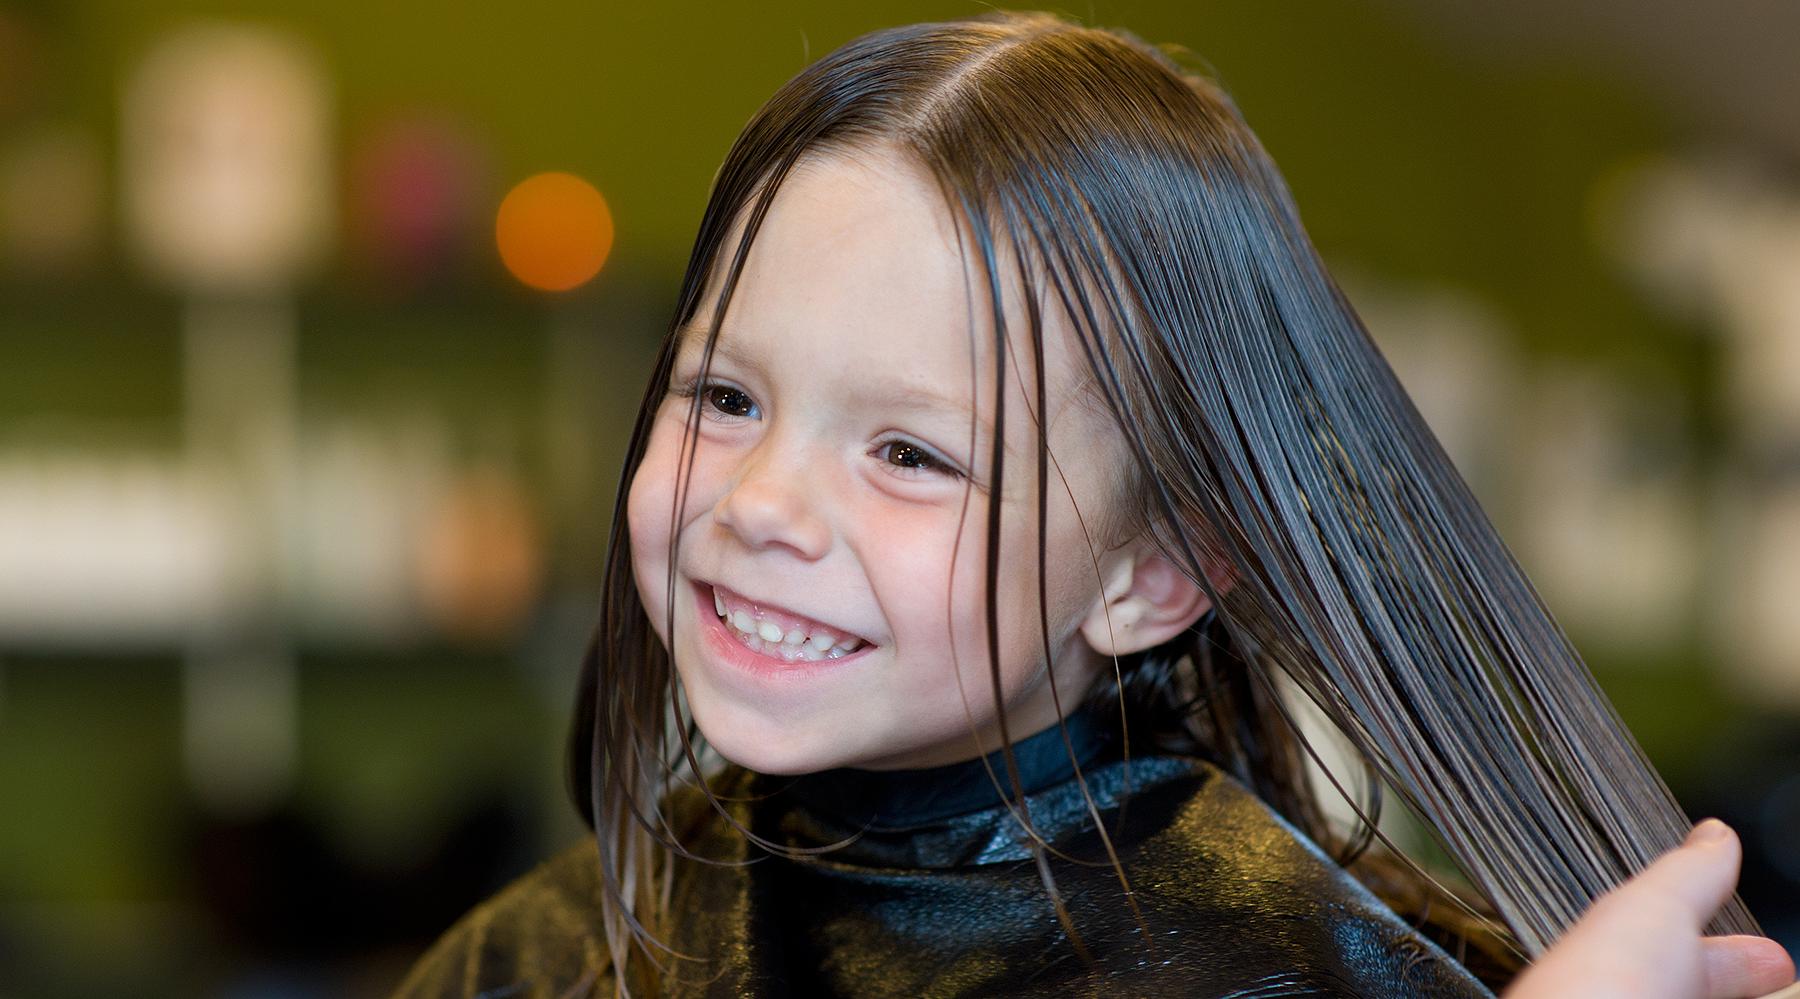 Girls Haircuts!